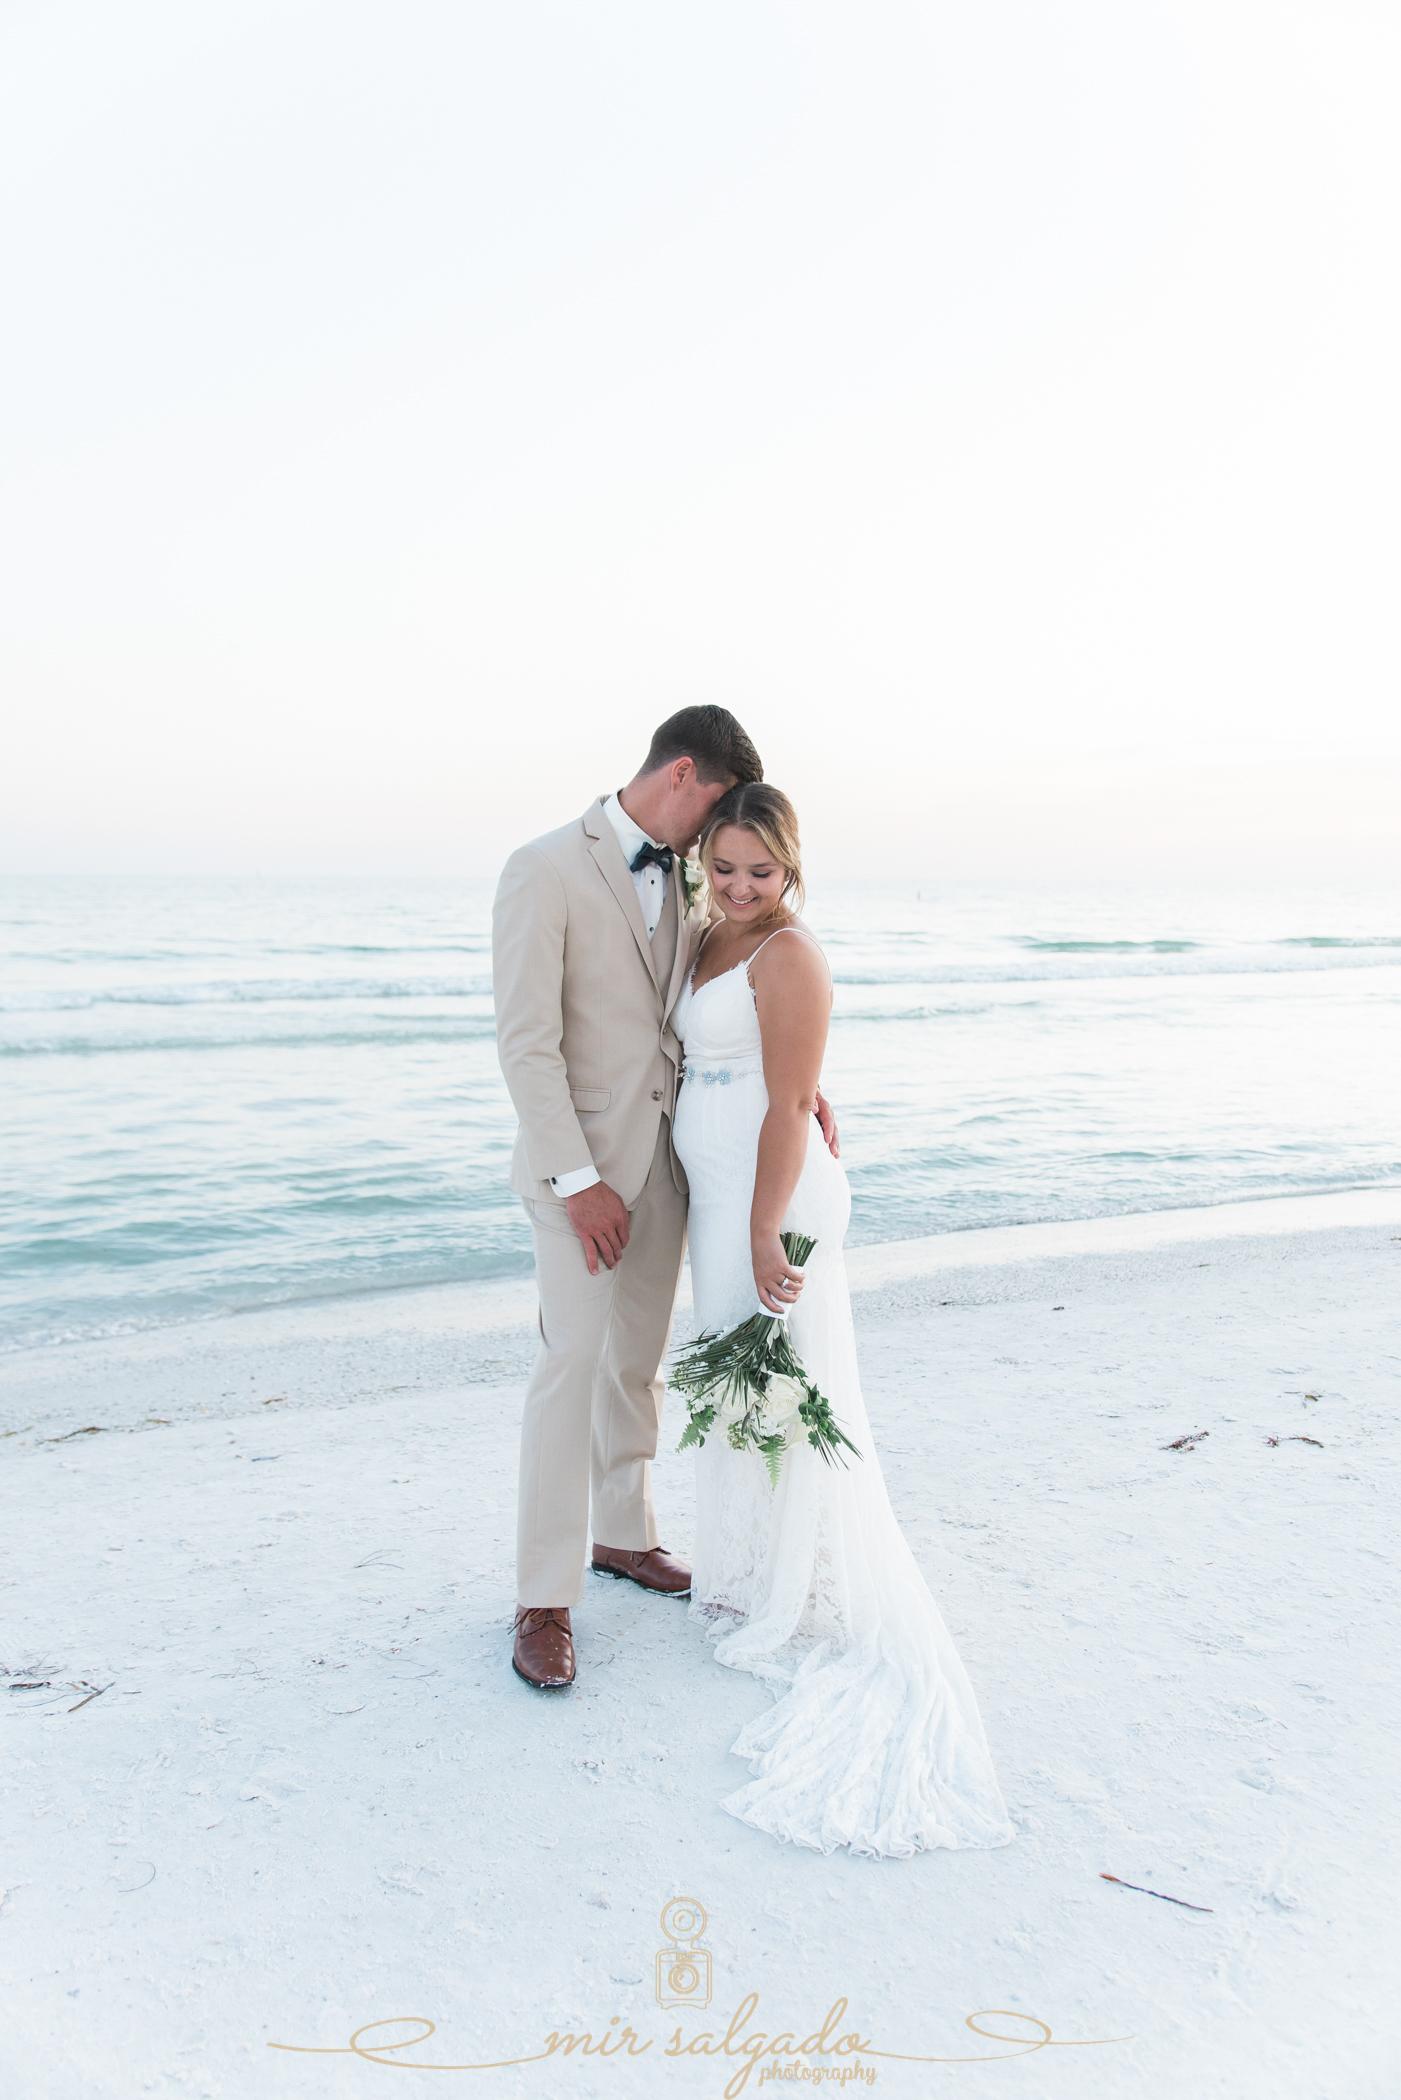 Destination-beach-wedding-photo, Florida-weddings, Tampa-wedding-photographer